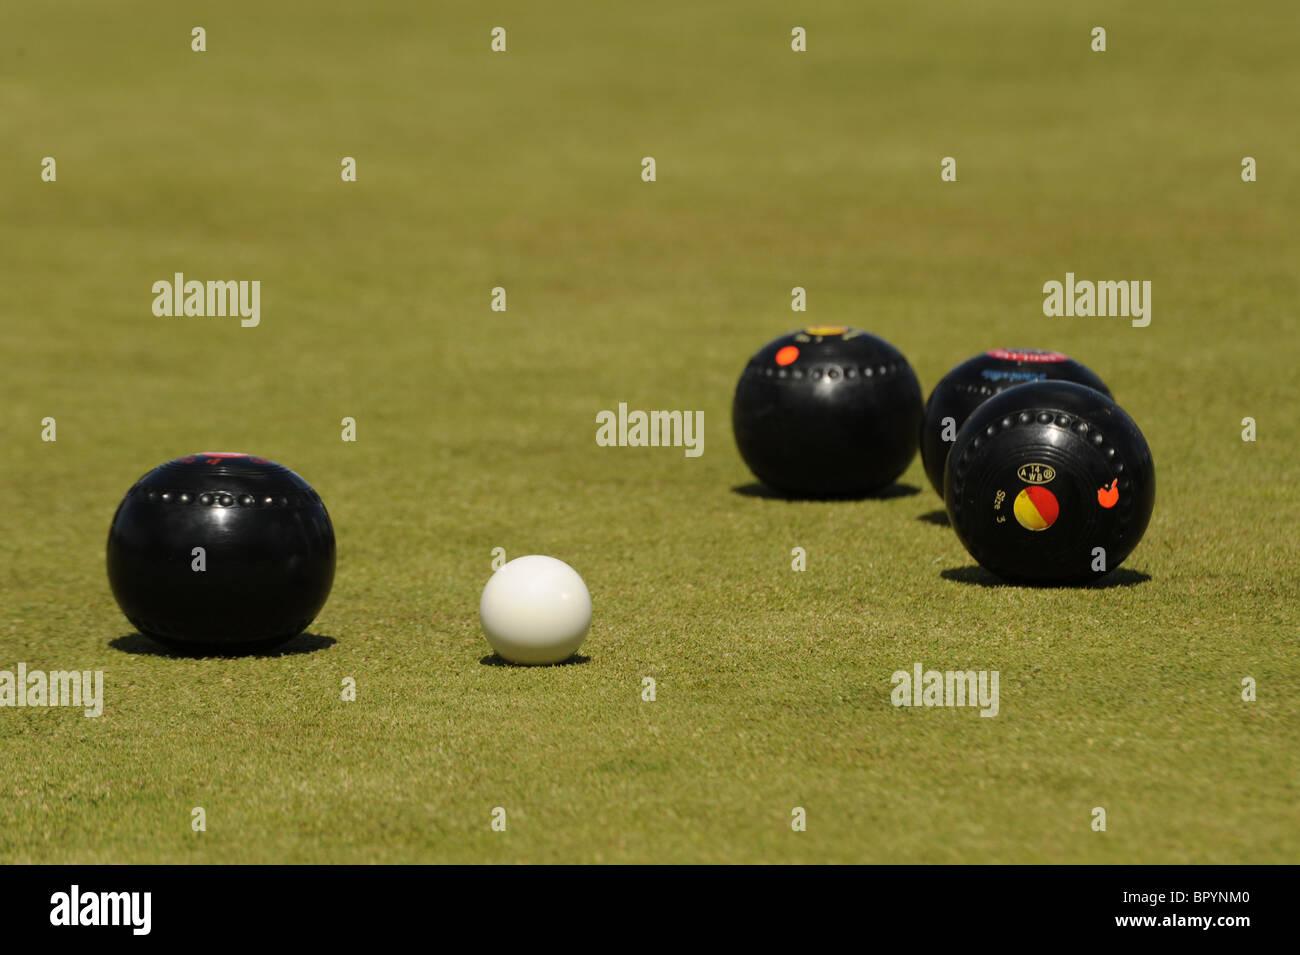 Lawn Bowls - Stock Image